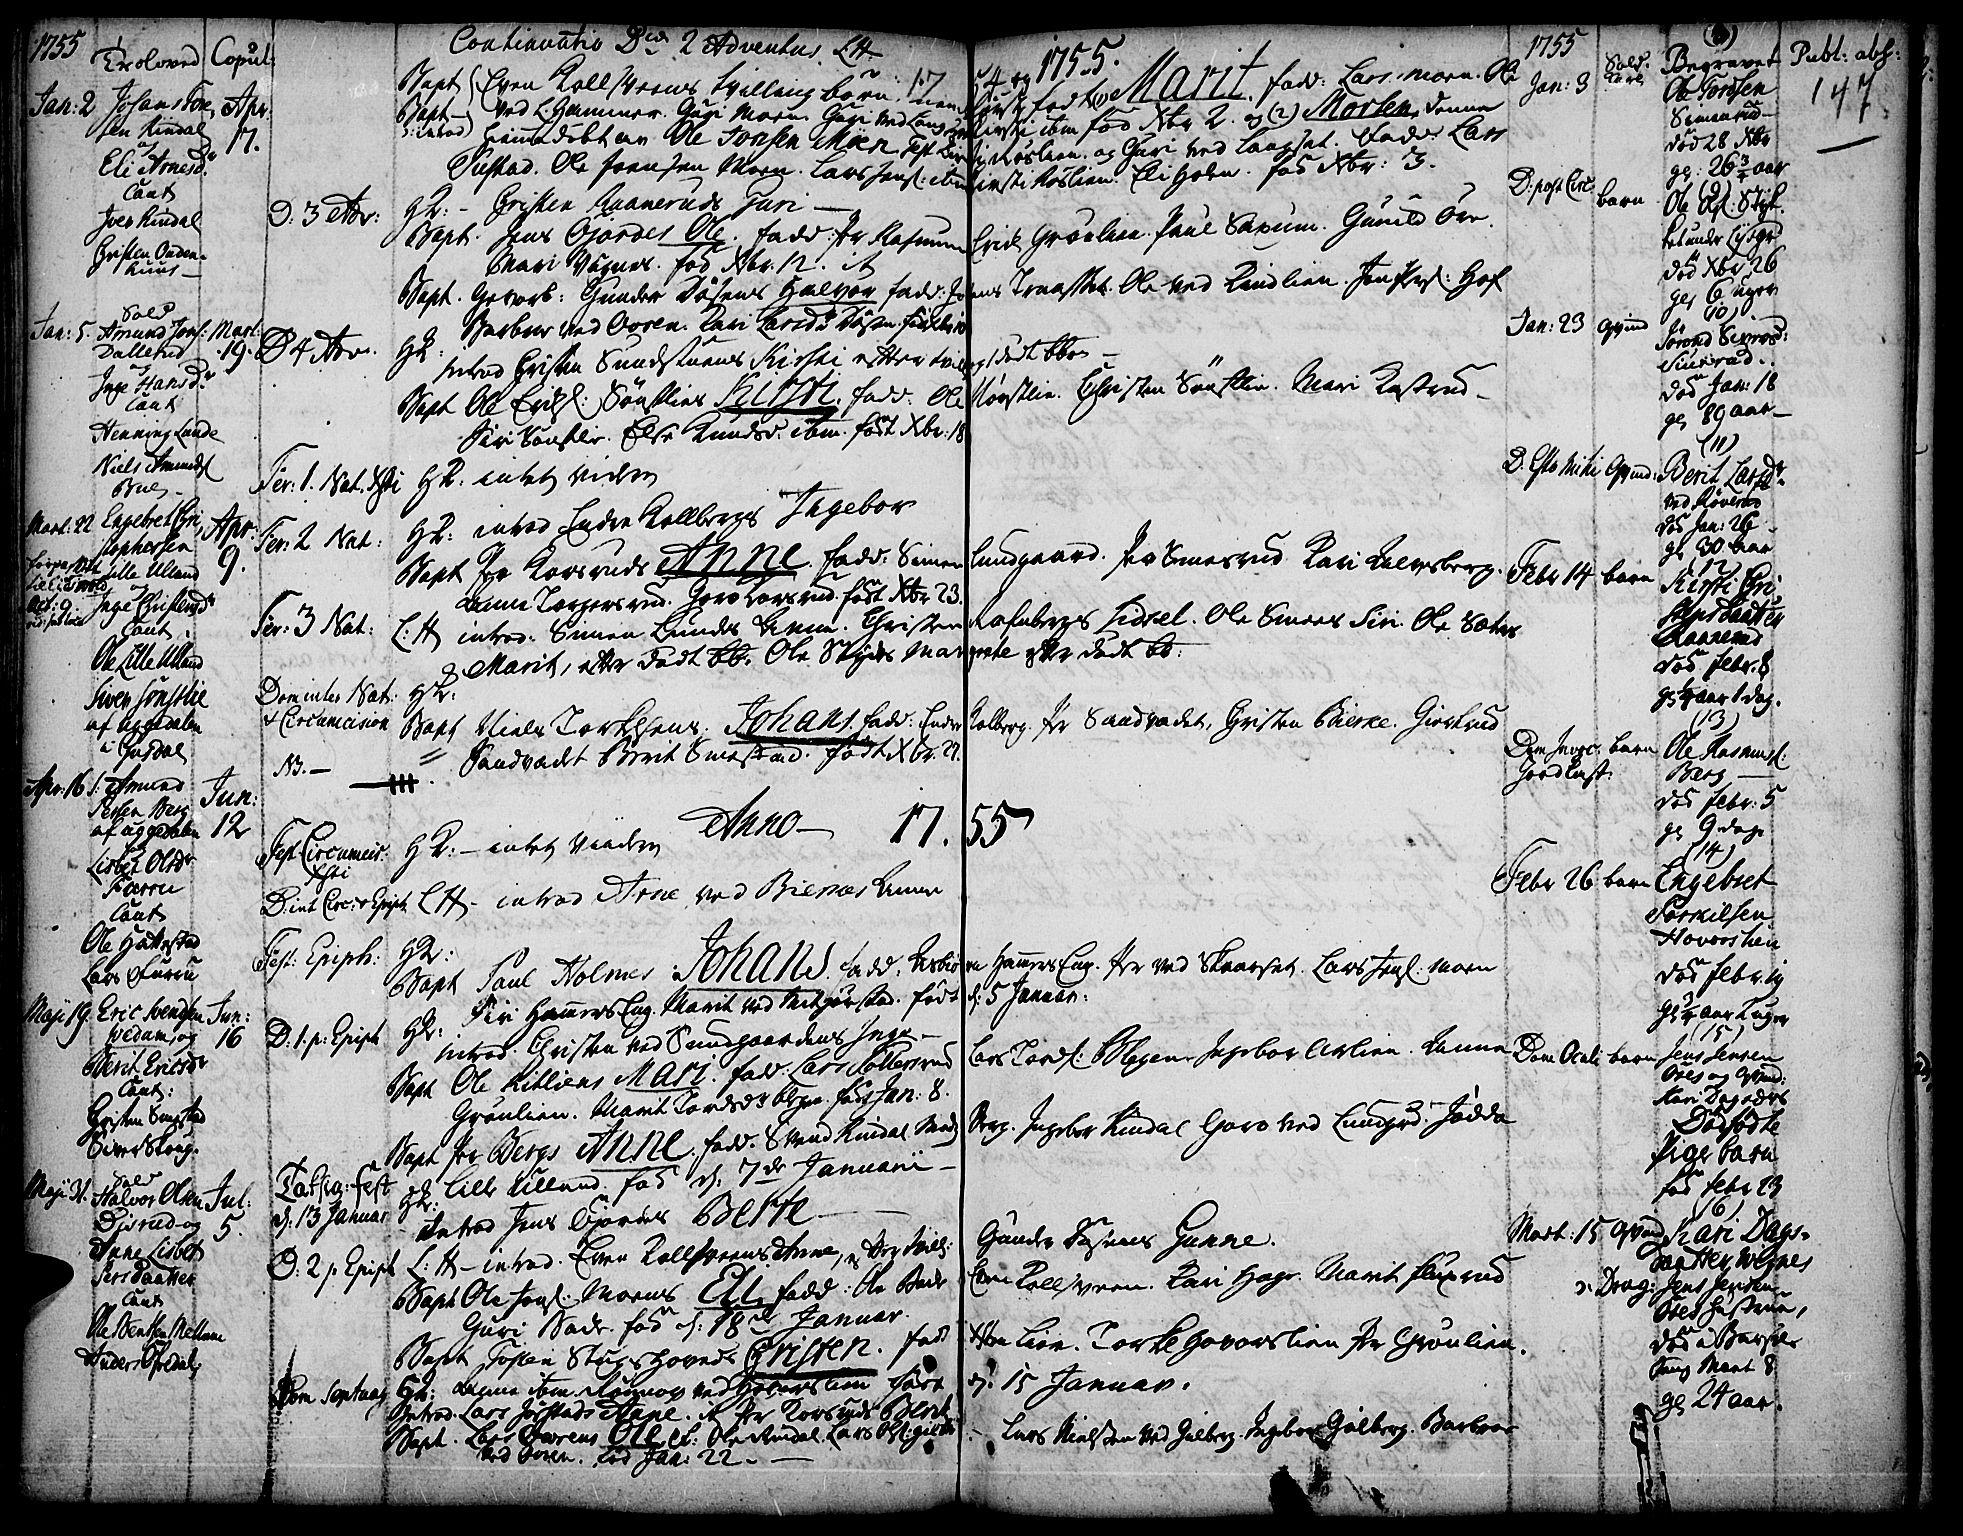 SAH, Fåberg prestekontor, Ministerialbok nr. 1, 1727-1775, s. 147